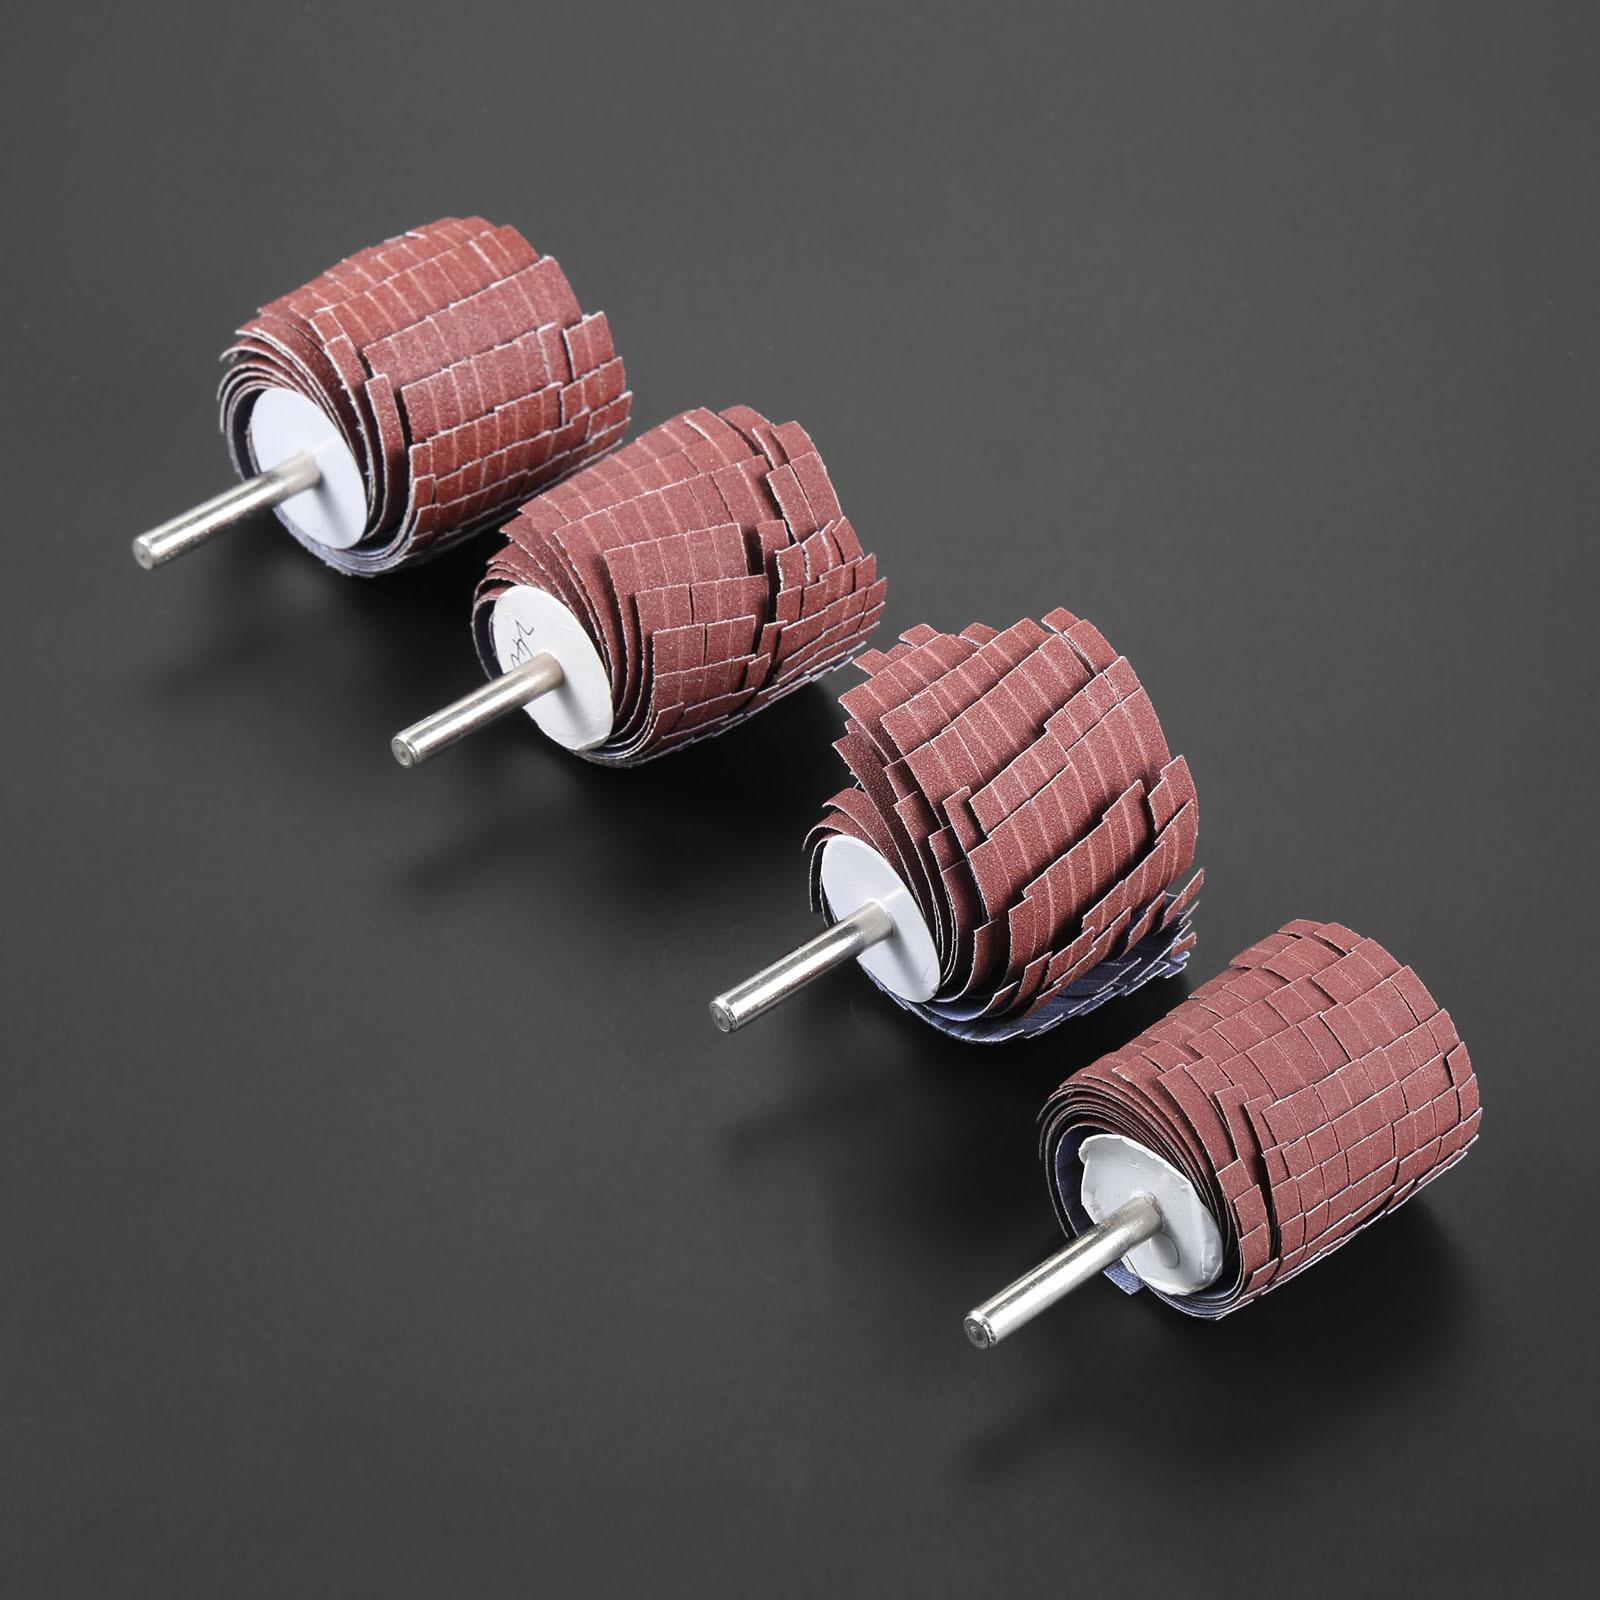 Купить с кэшбэком DRELD 1Pc Dremel Accessories 150-400 Grit Sanding Flap Wheel 6mm Shank Sanding Grinding Sand Paper Shutter Wheel for Rotary Tool